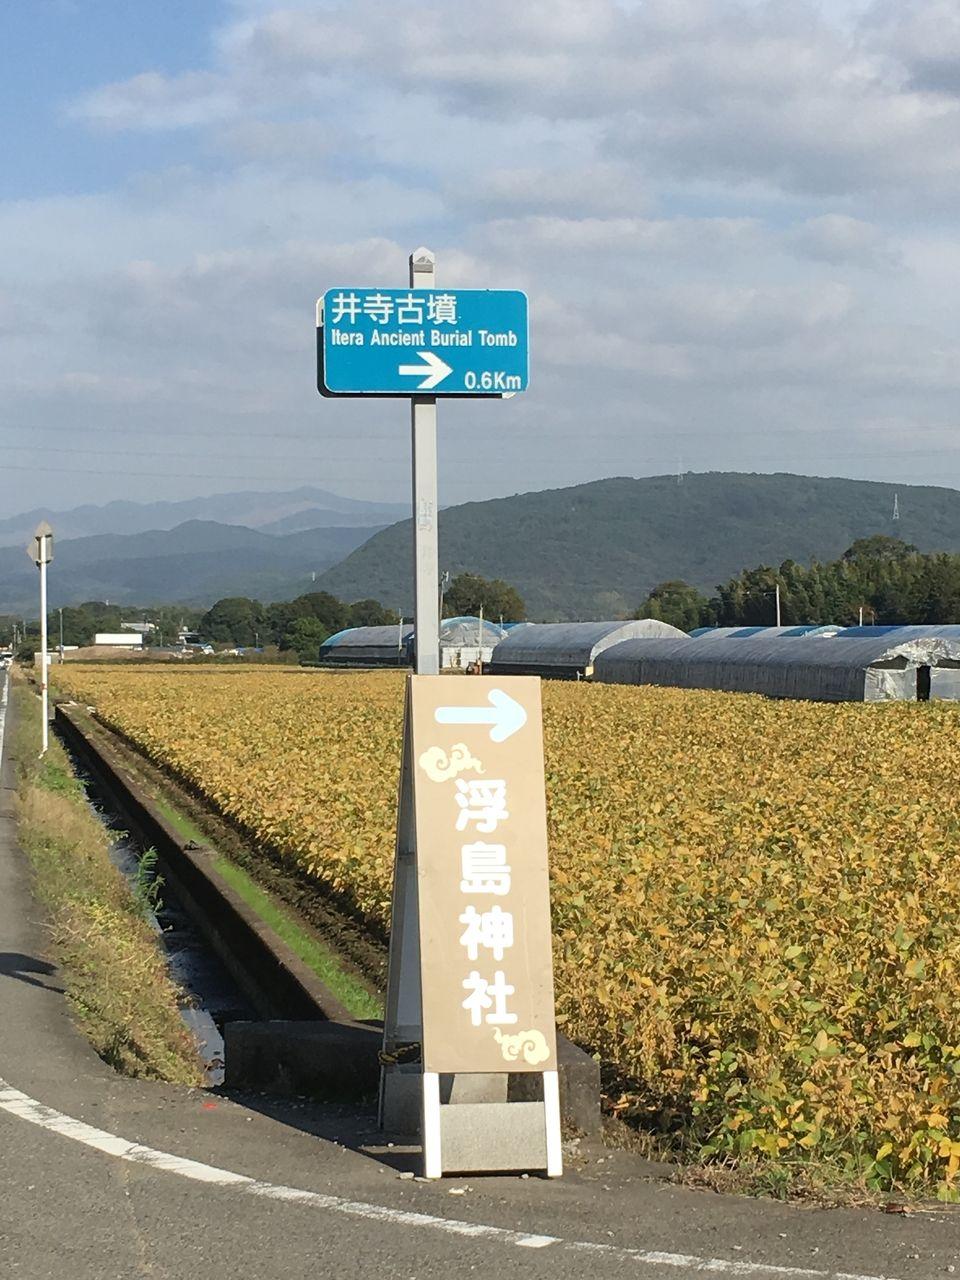 浮島熊野座神社と井寺古墳の案内板